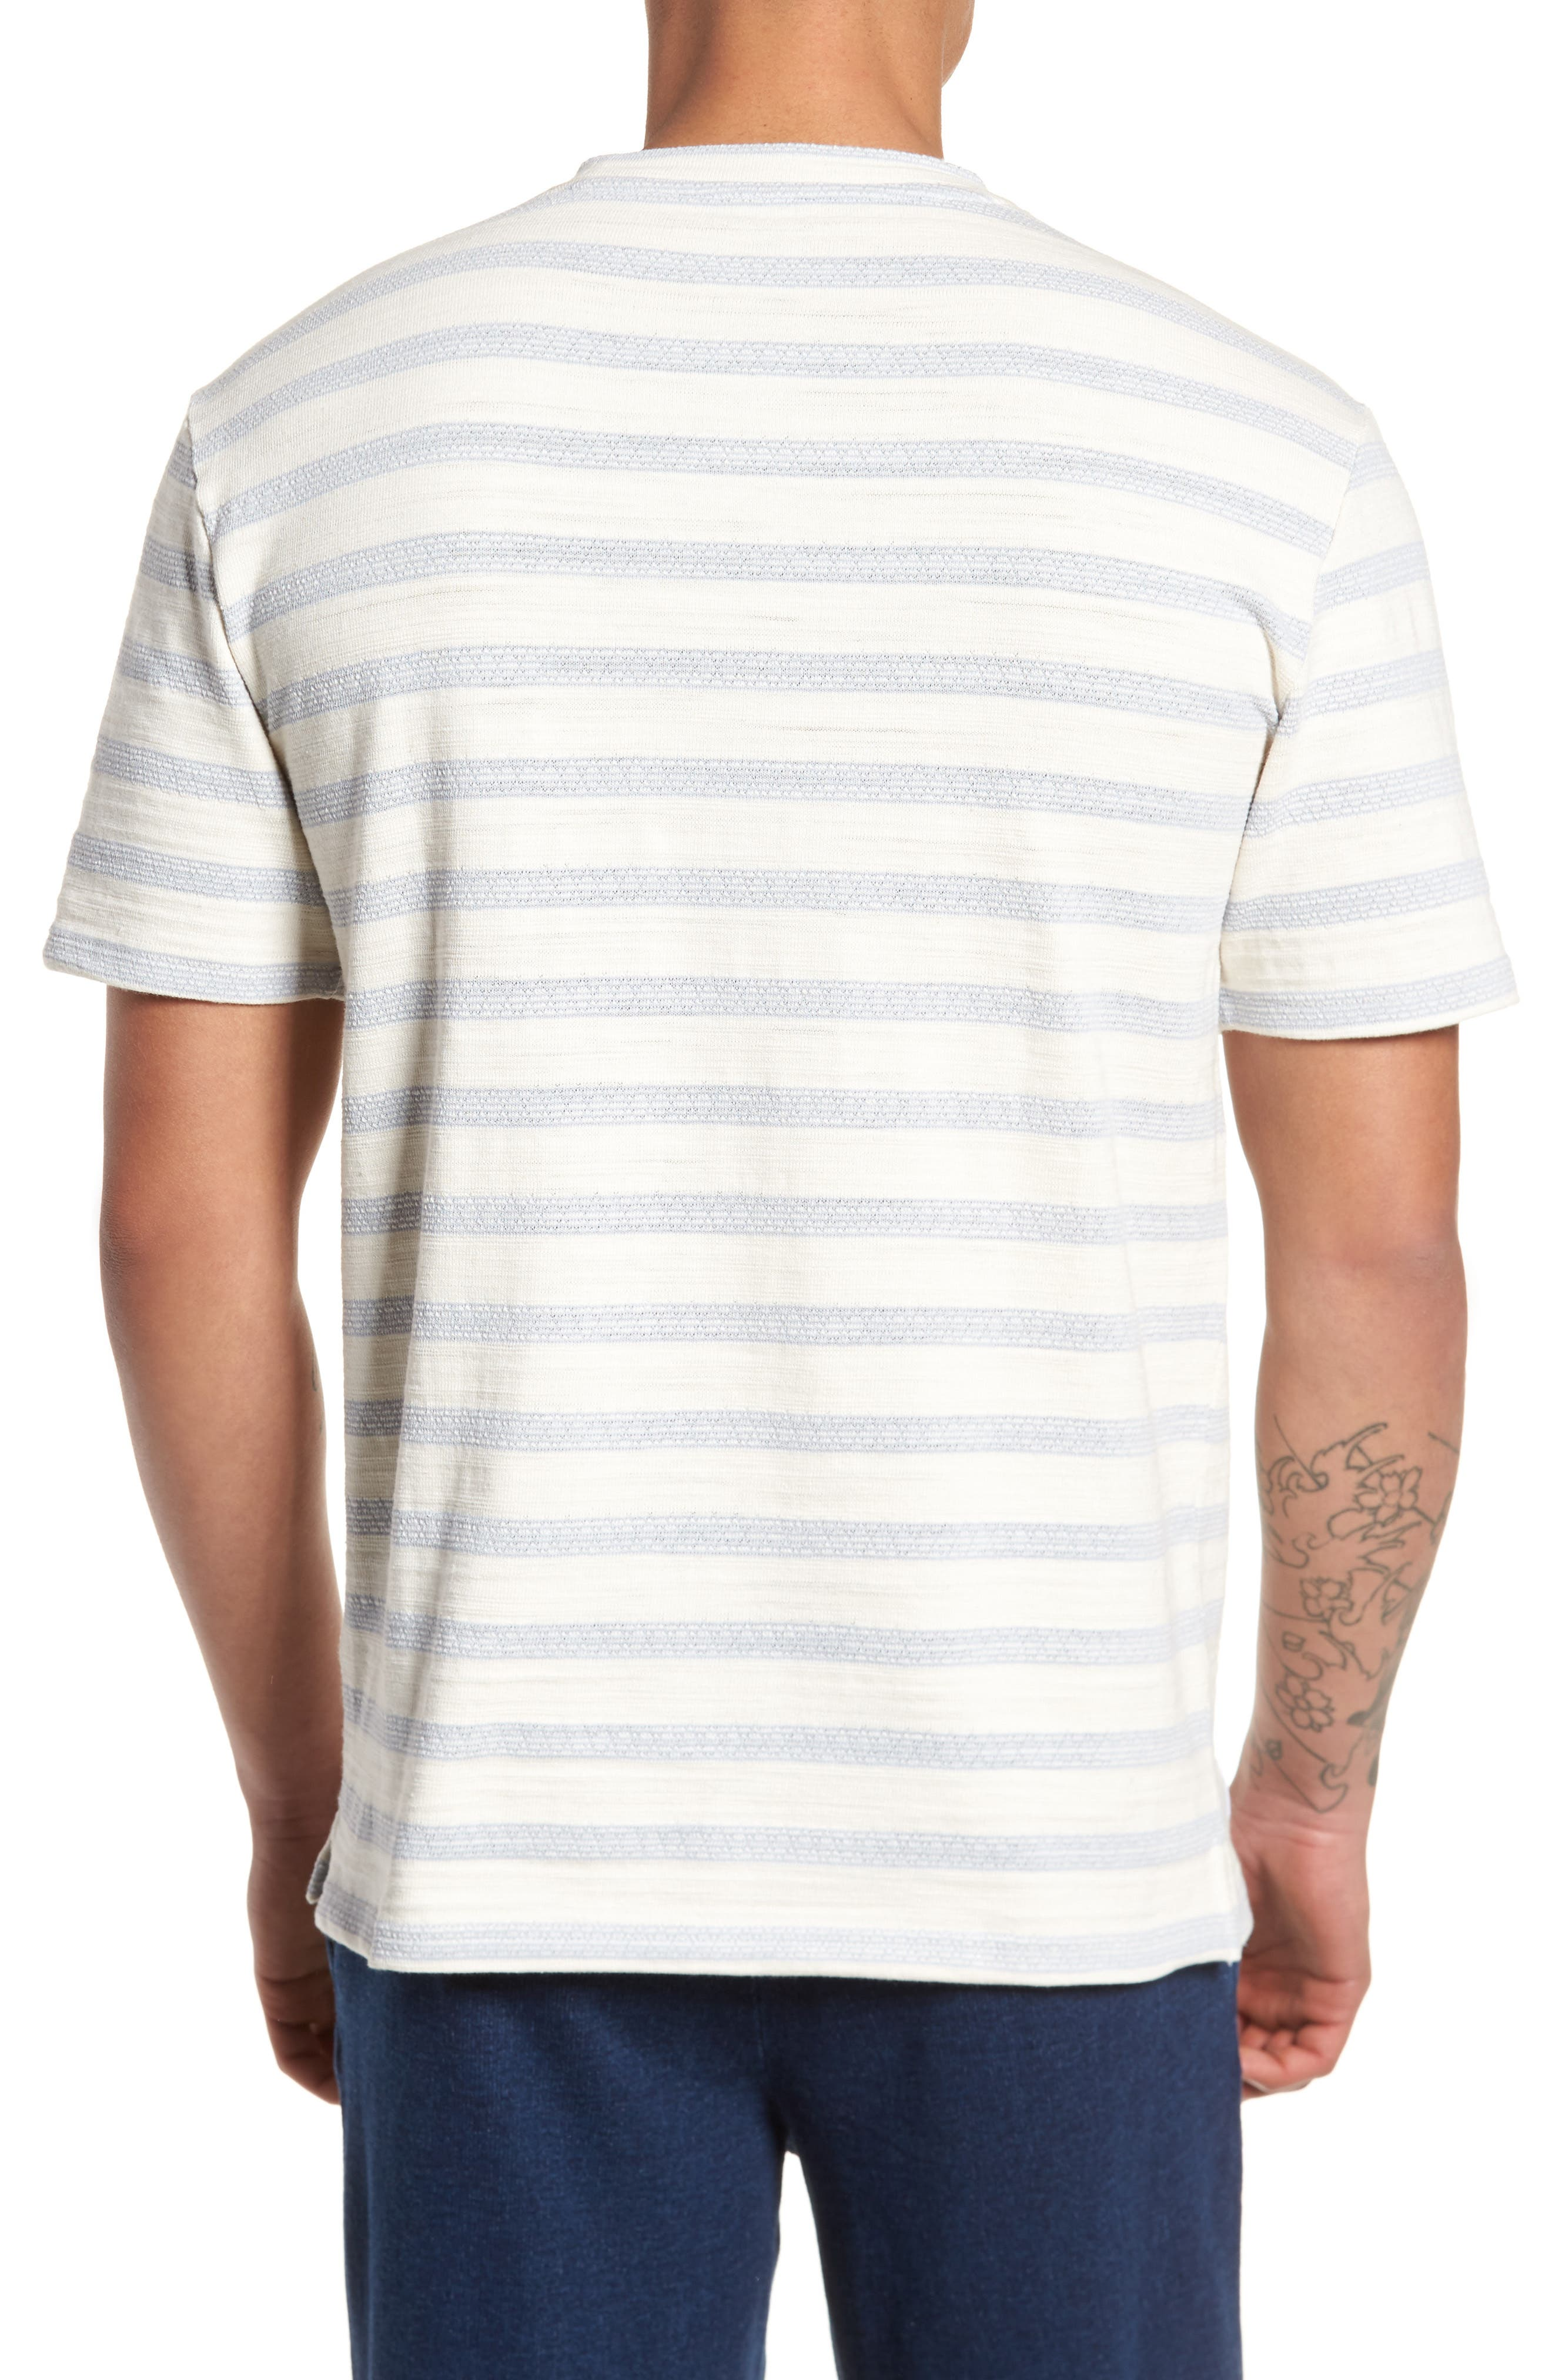 Waves T-Shirt,                             Alternate thumbnail 2, color,                             900